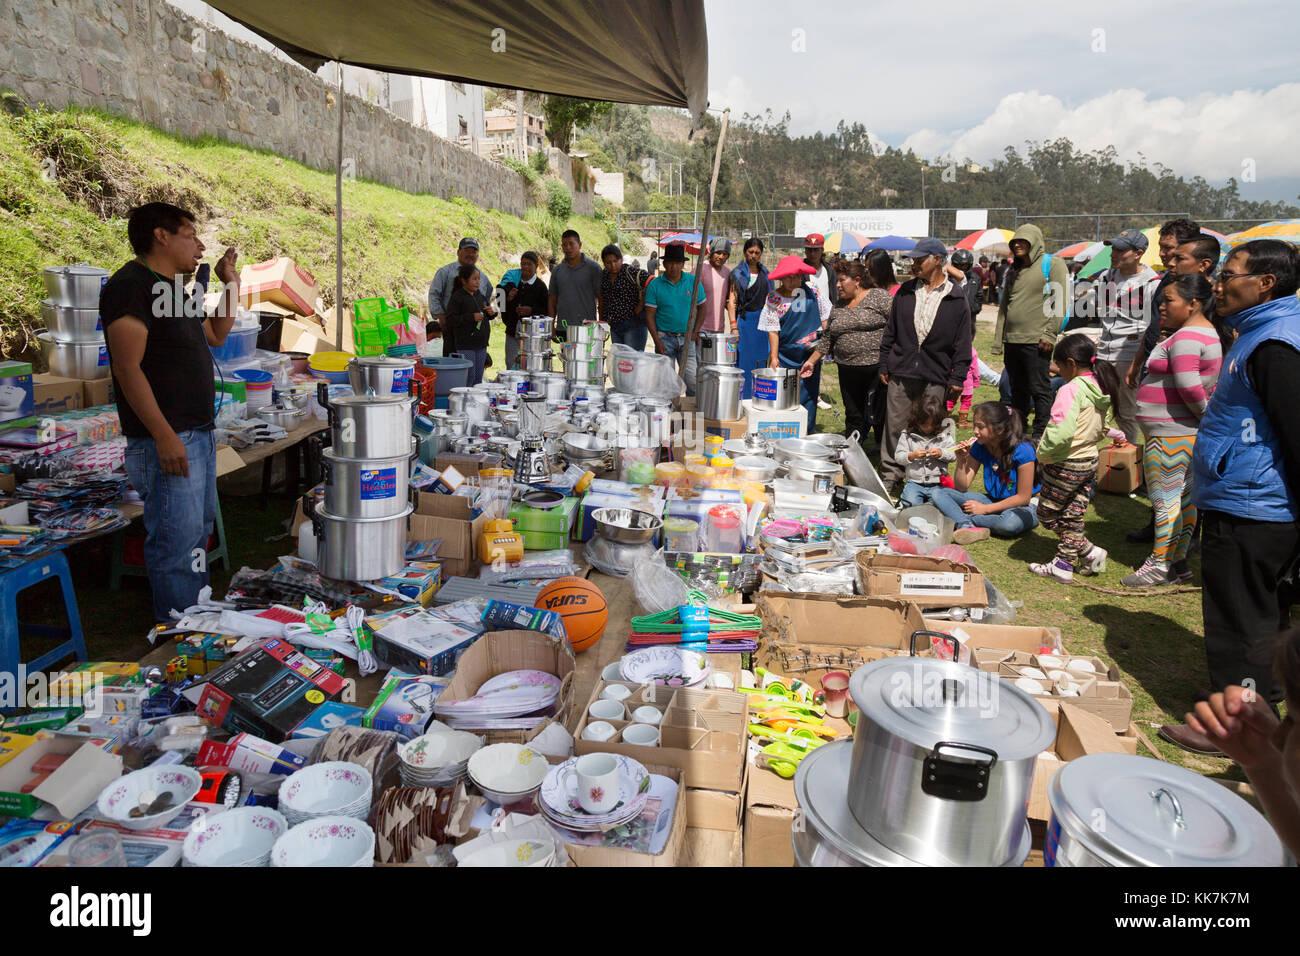 People shopping at Otavalo Market stall, Otavalo, Ecuador, South America - Stock Image